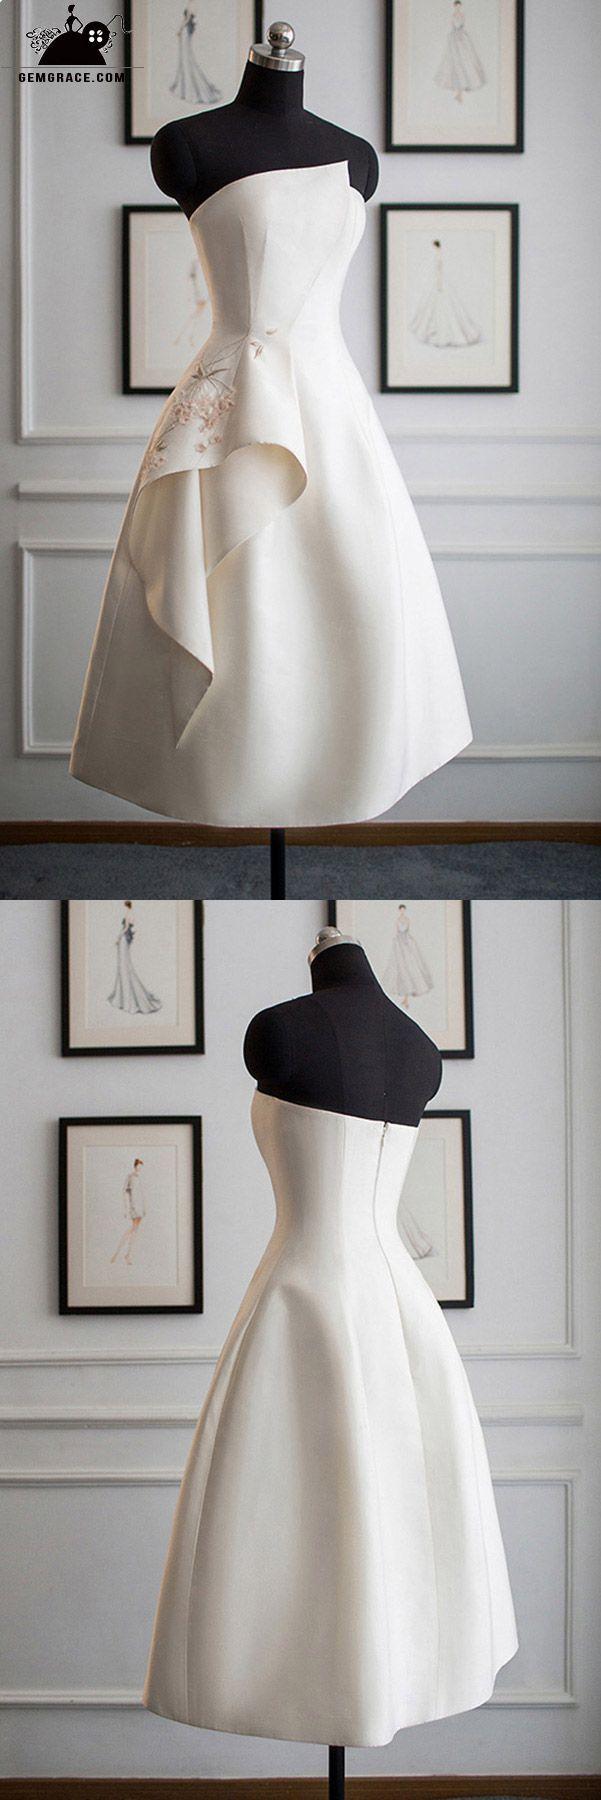 Unique ruffled short wedding dress with flounce